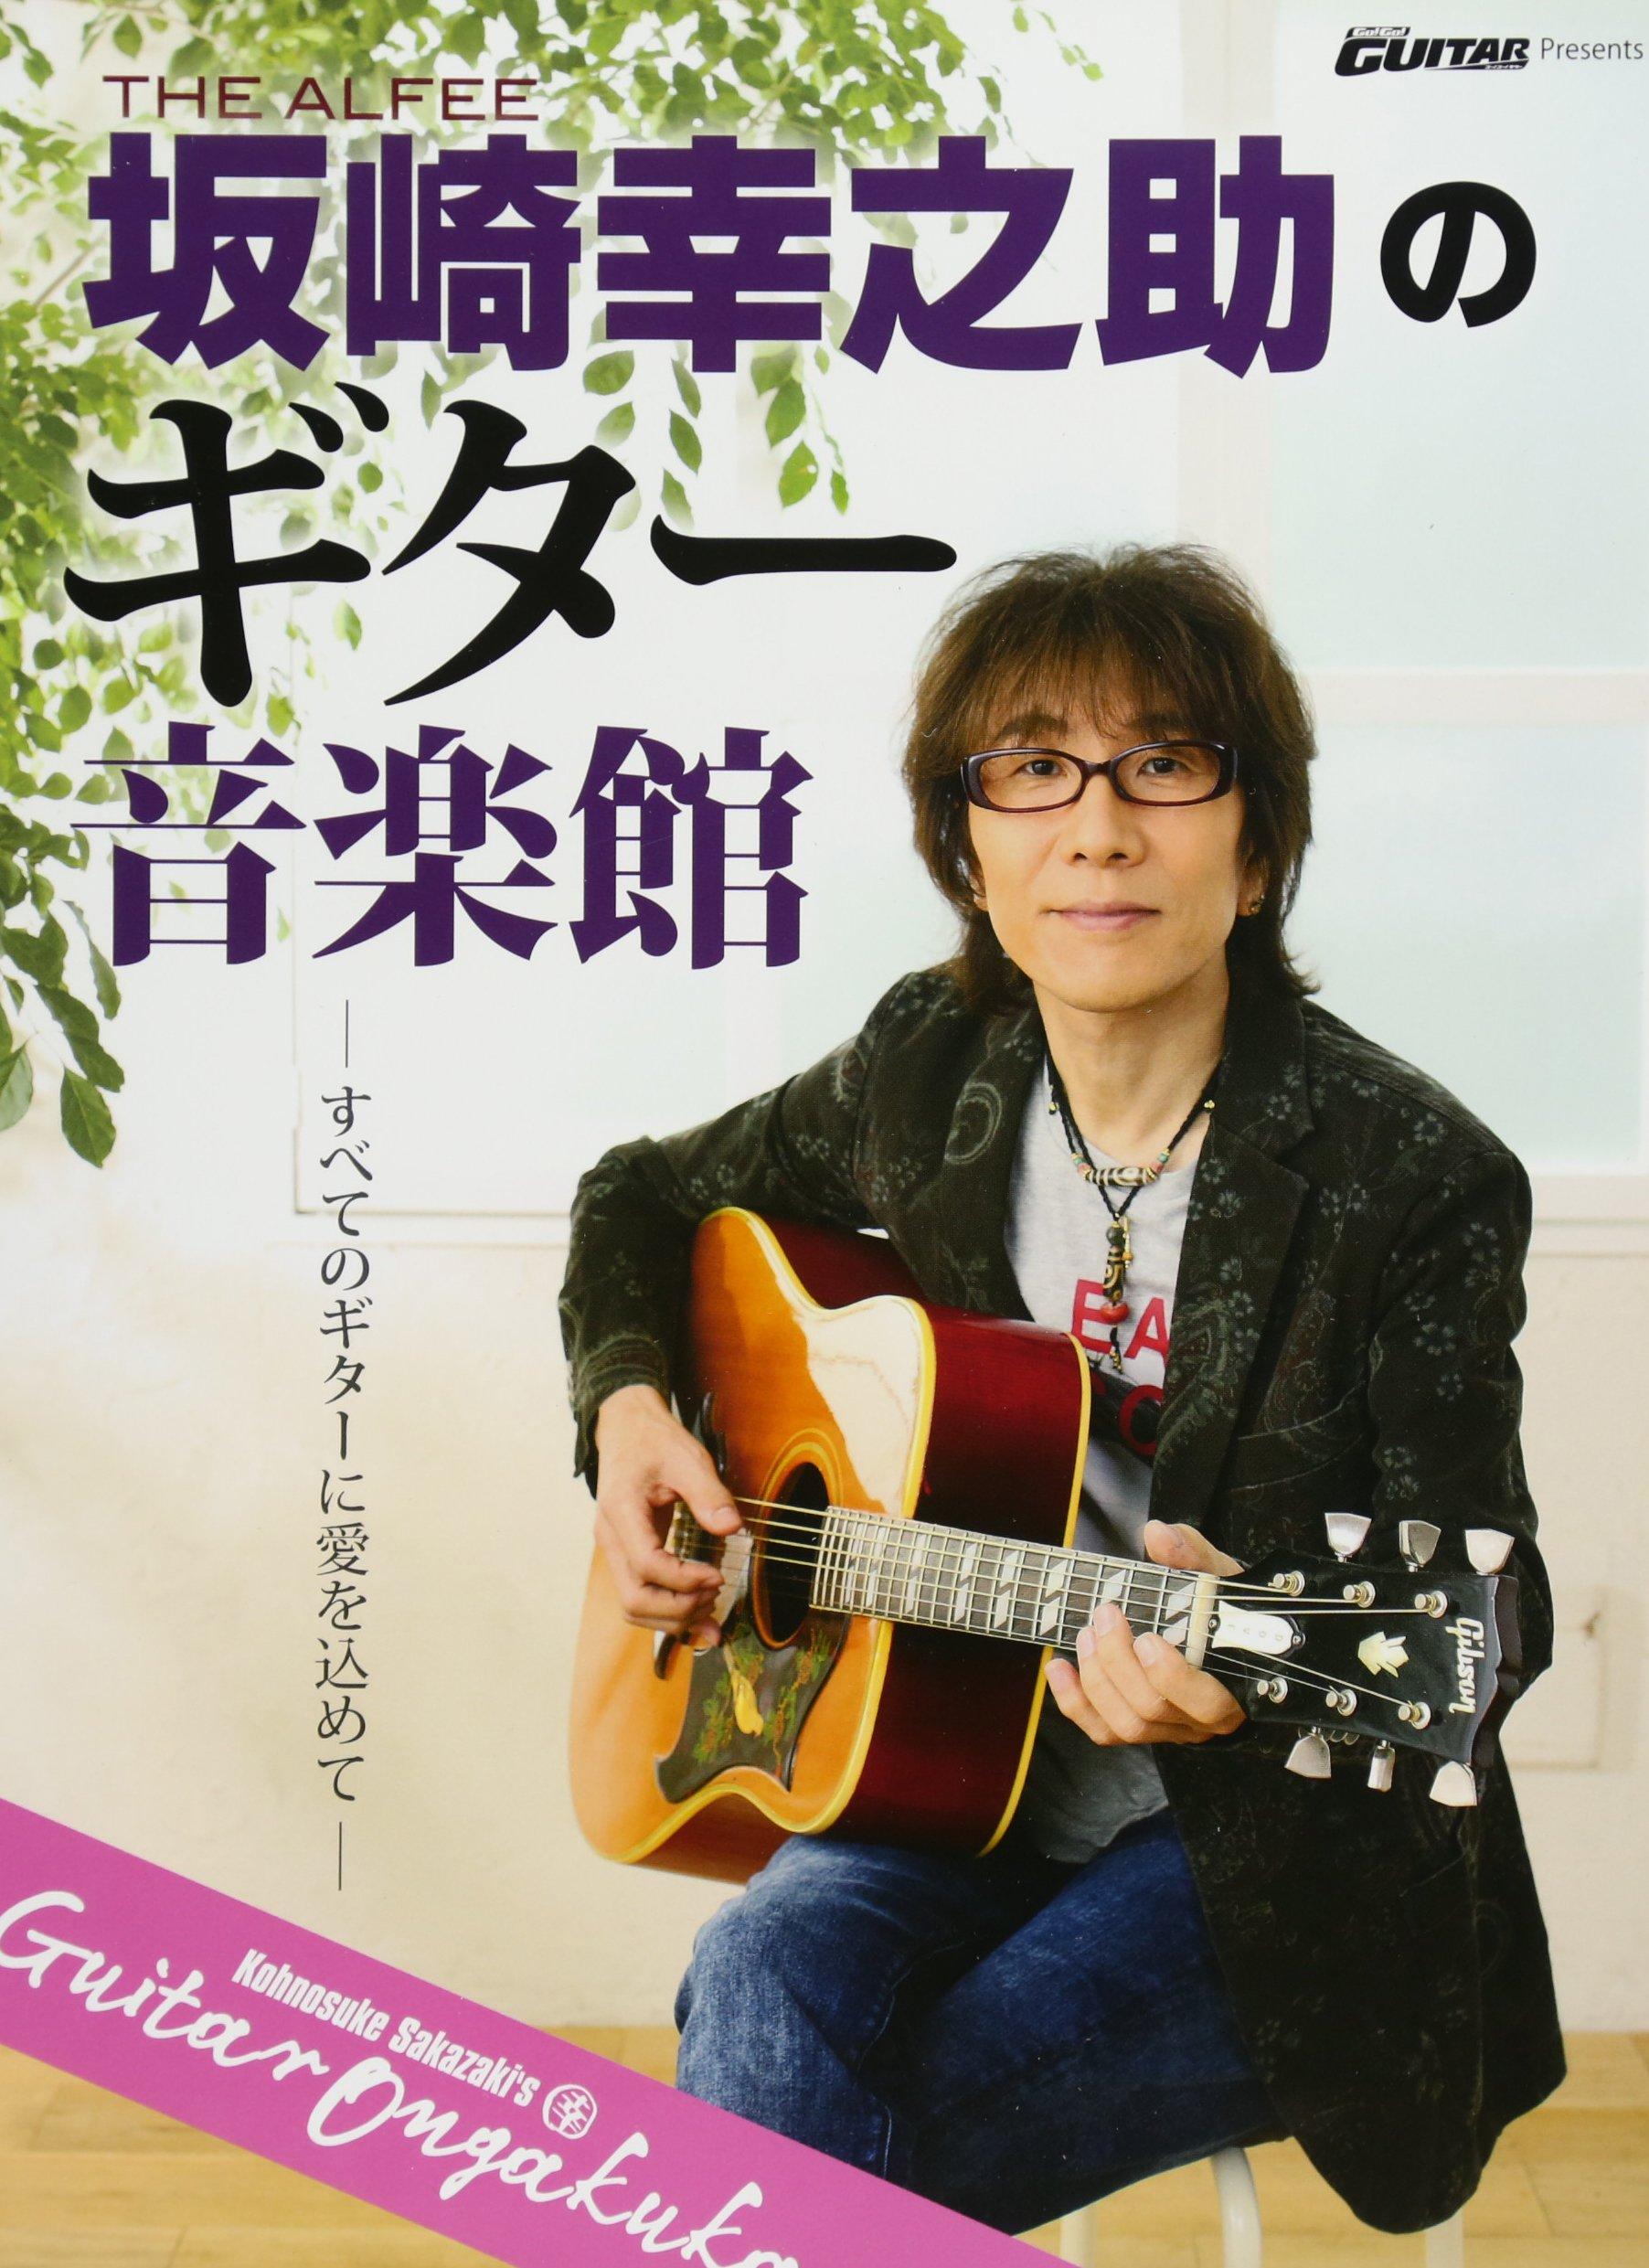 Go!Go!GUITAR Presents 『THE ALFEE 坂崎幸之助のギター音楽館 ...